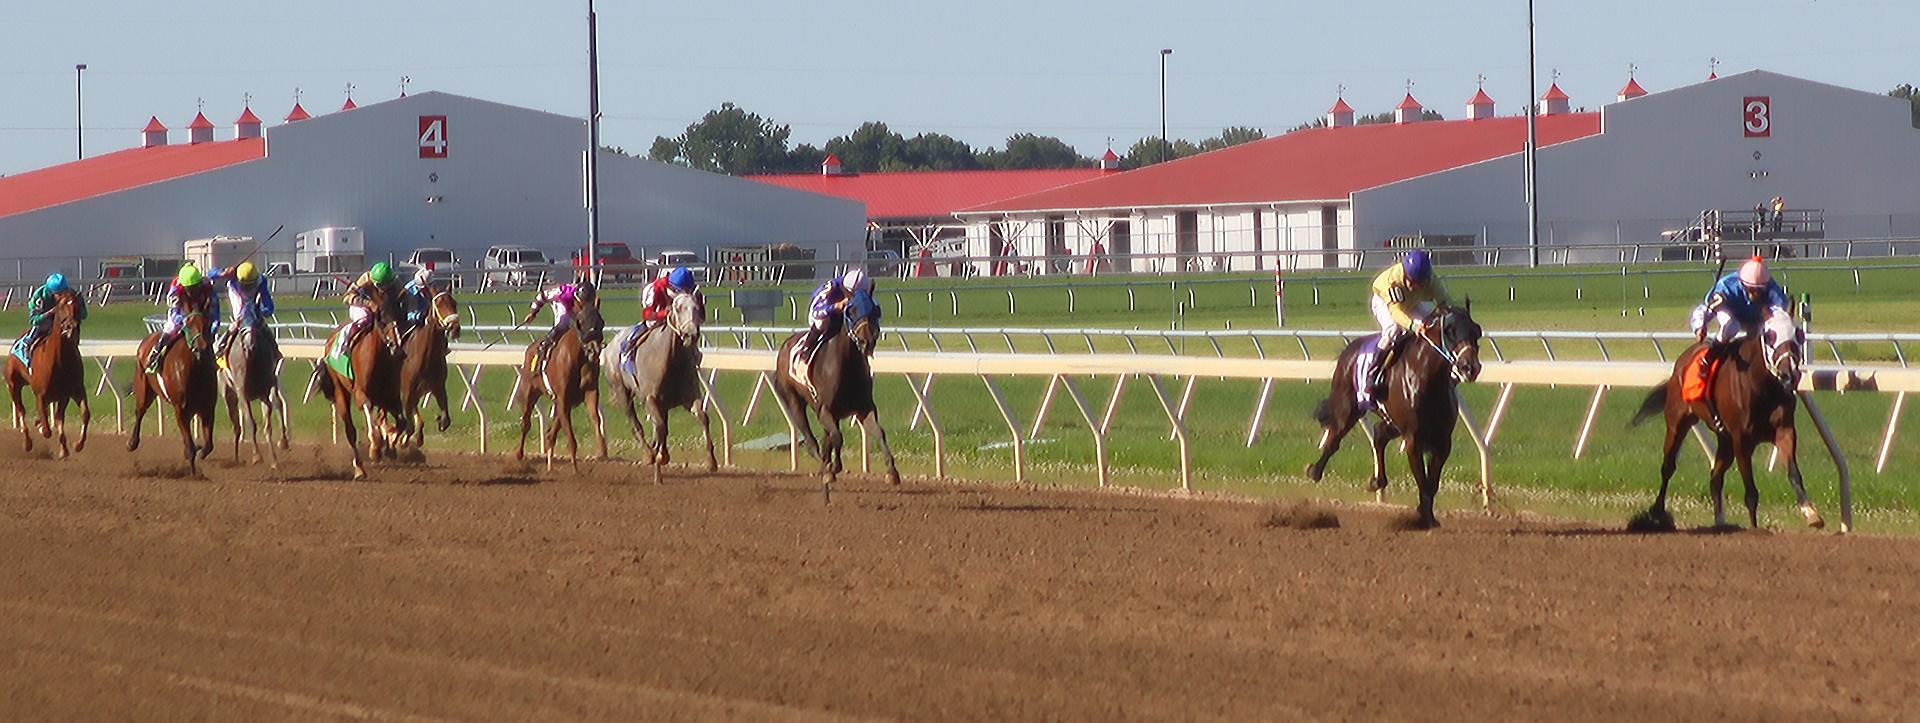 Horse-racing_1x3-0055-W